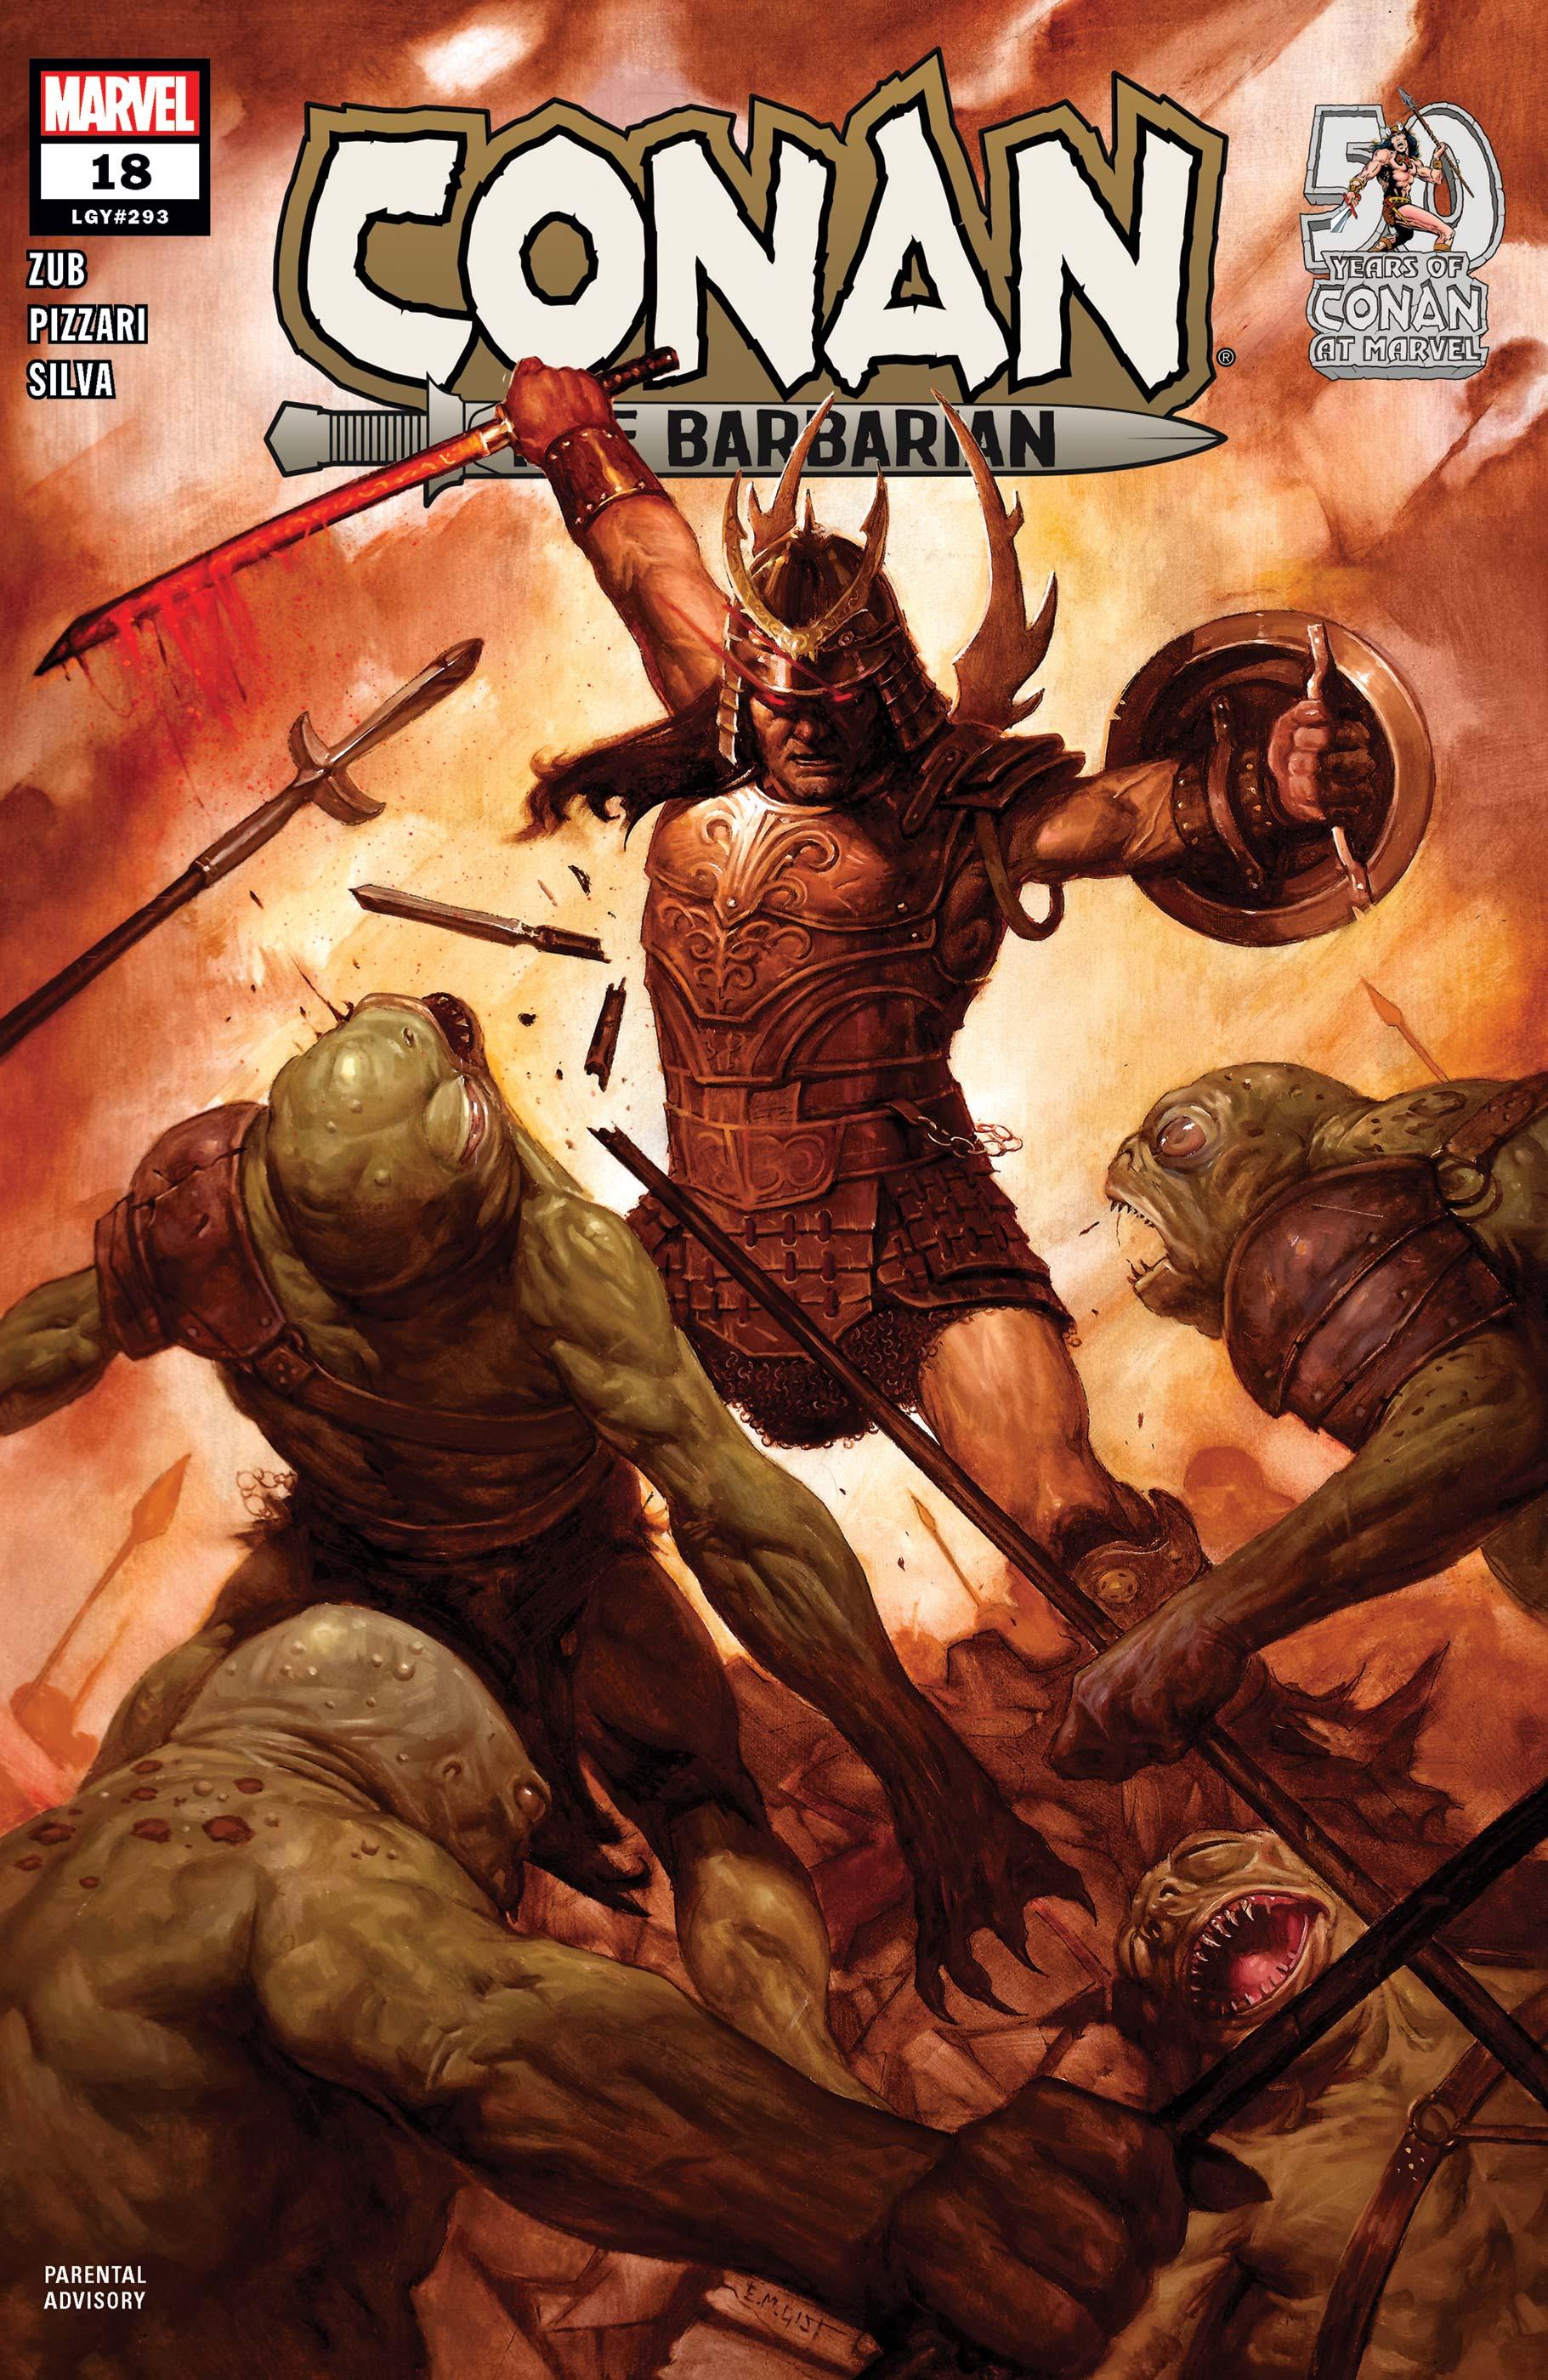 Conan the Barbarian (2019) #18